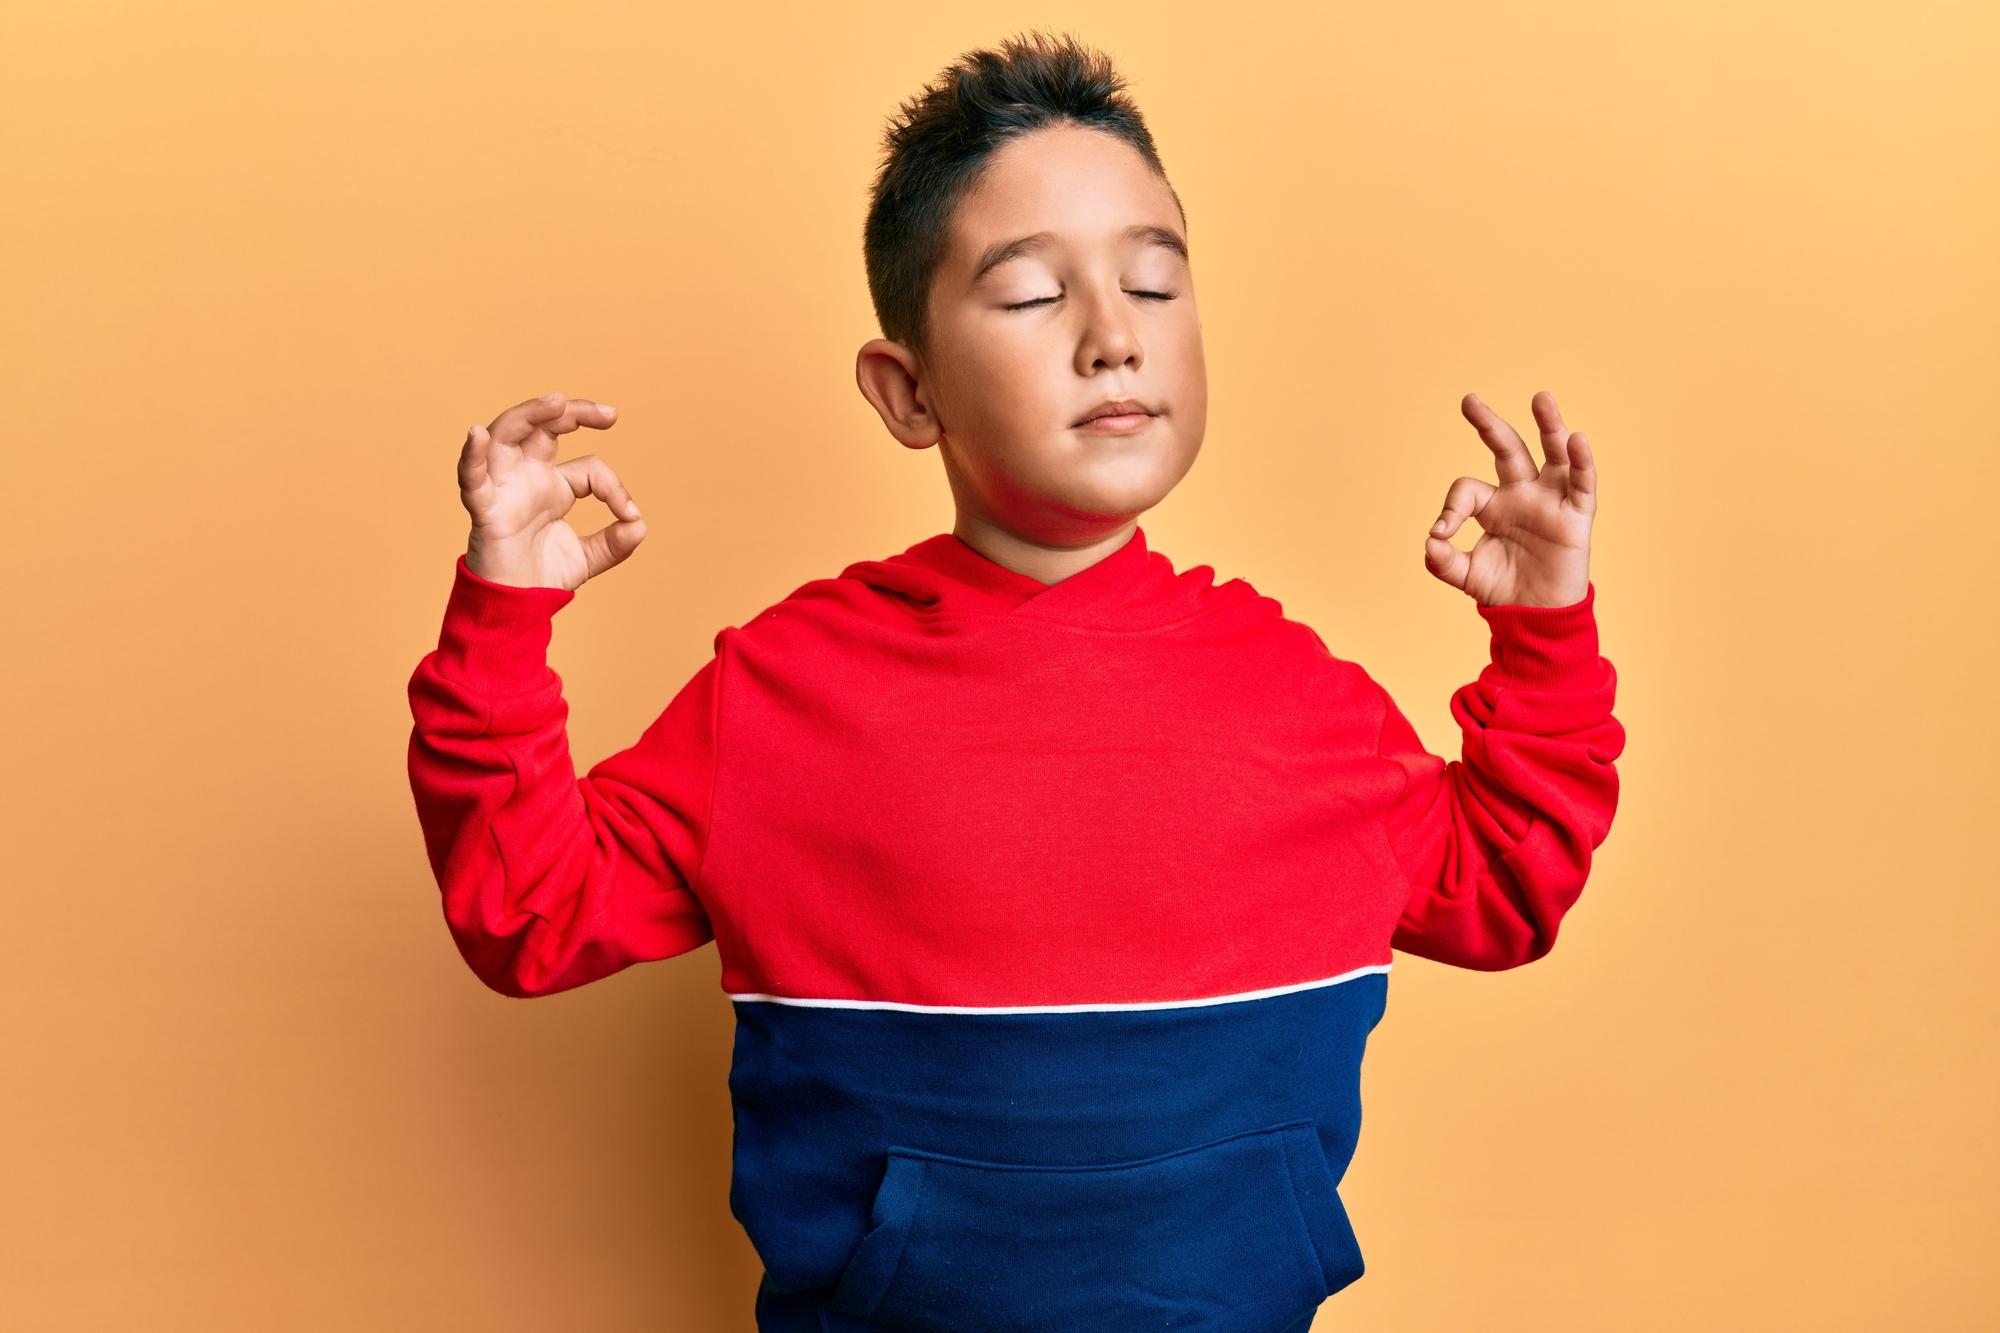 Kindereinfach_Onlinekurs_meditierender Junge